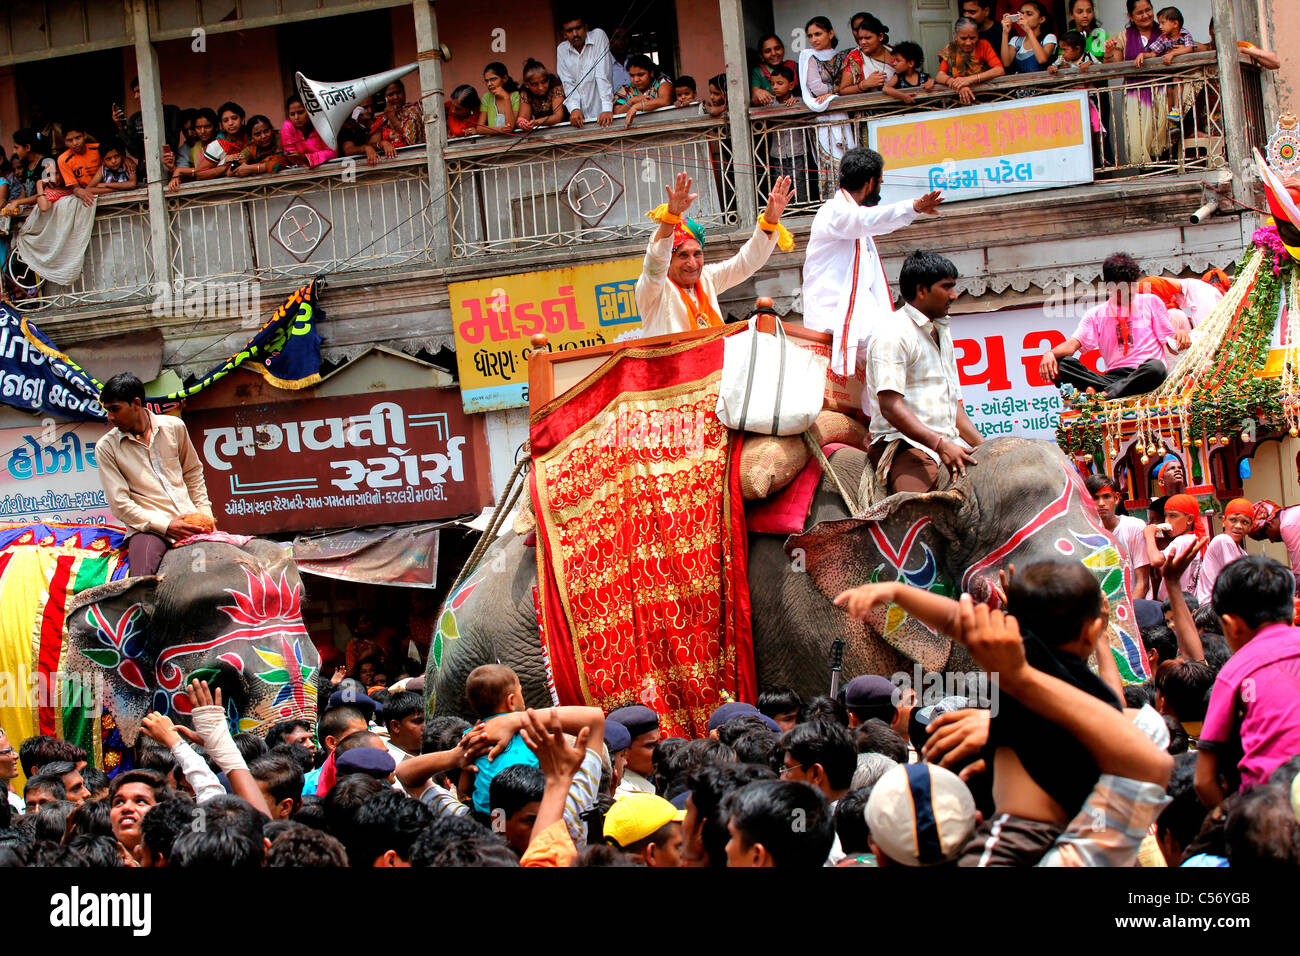 Rath yatra procession in Ahmedabad, Gujarat,india - Stock Image